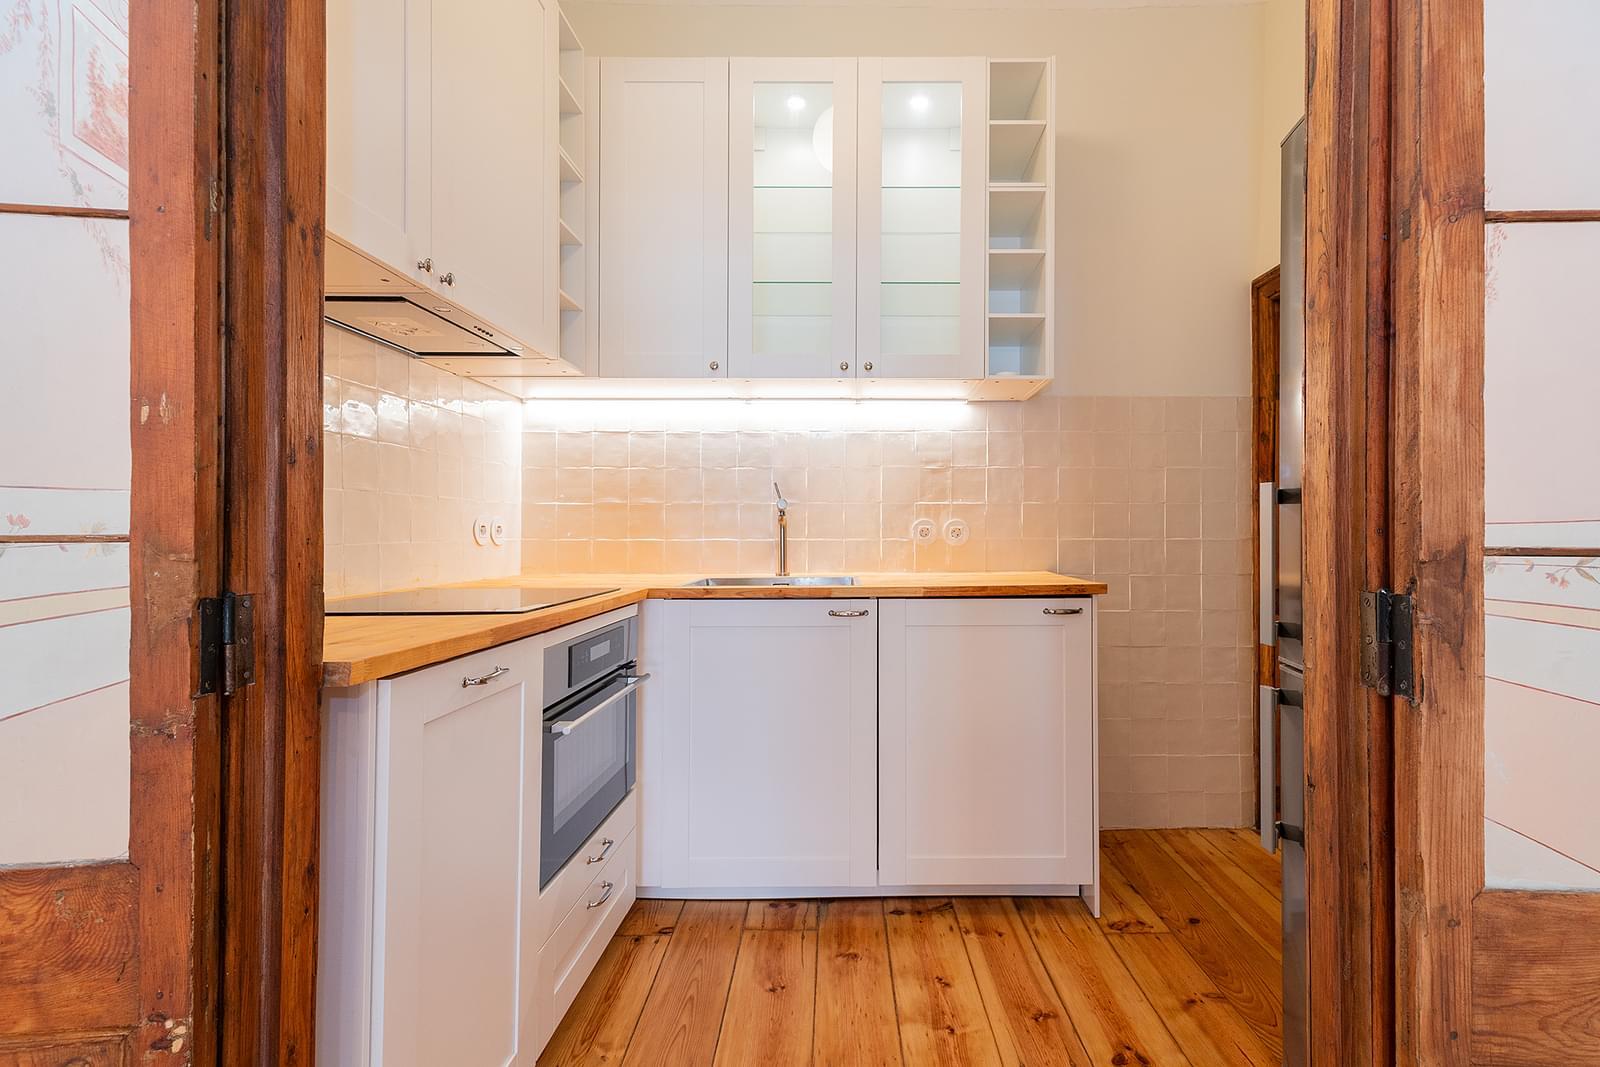 pf18016-apartamento-t2-1-lisboa-5e1d0256-b990-4414-89fc-0e90094152b1